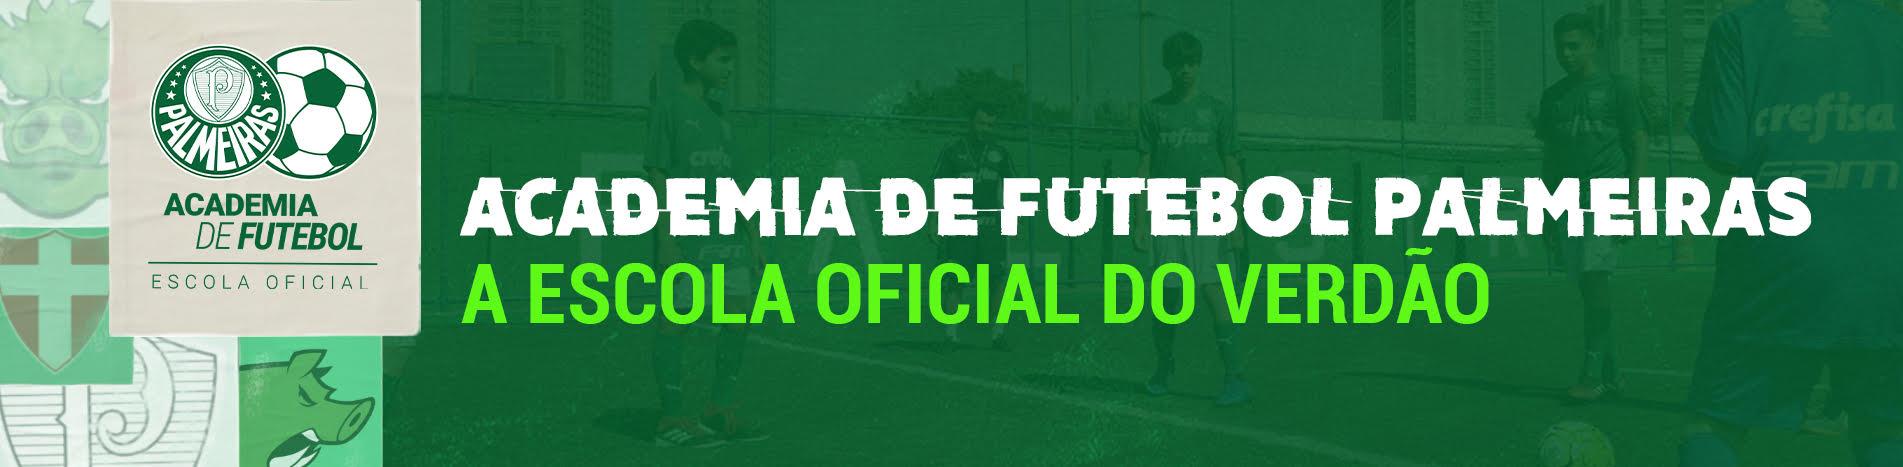 Academia de Futebol   Escola Oficial